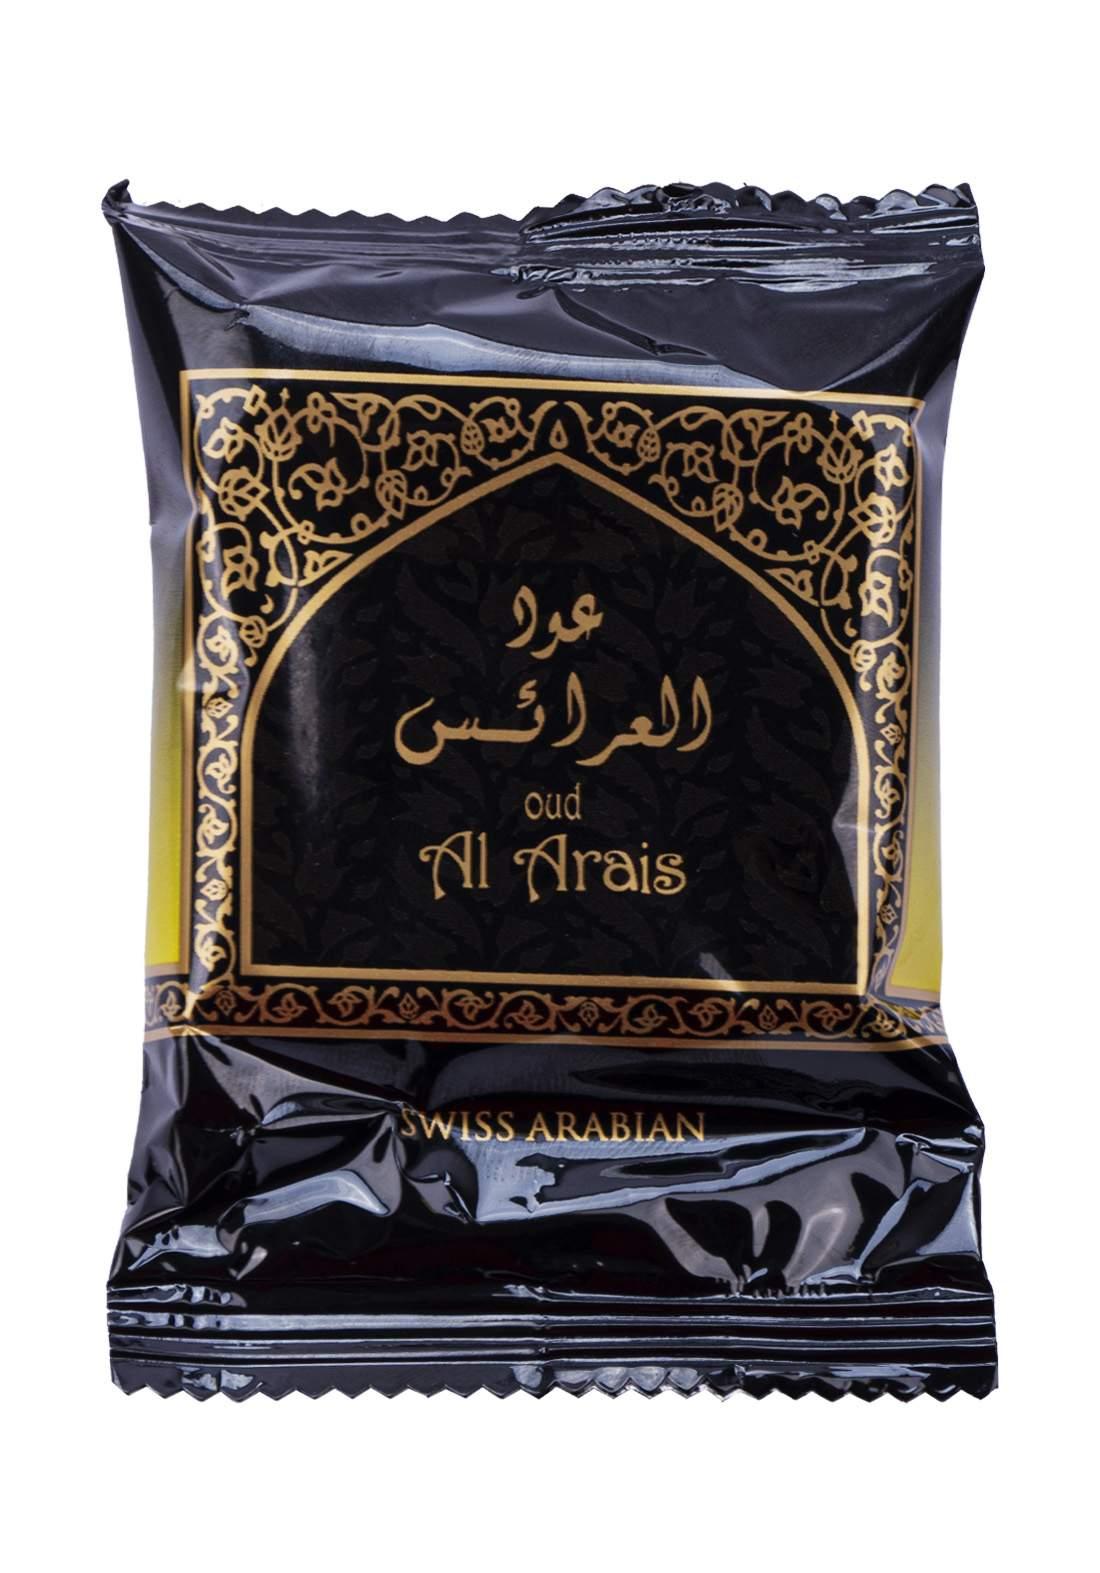 Swiss Arabian 1401 Oud Al Arais 40g Block Bakhoor Incense بخور